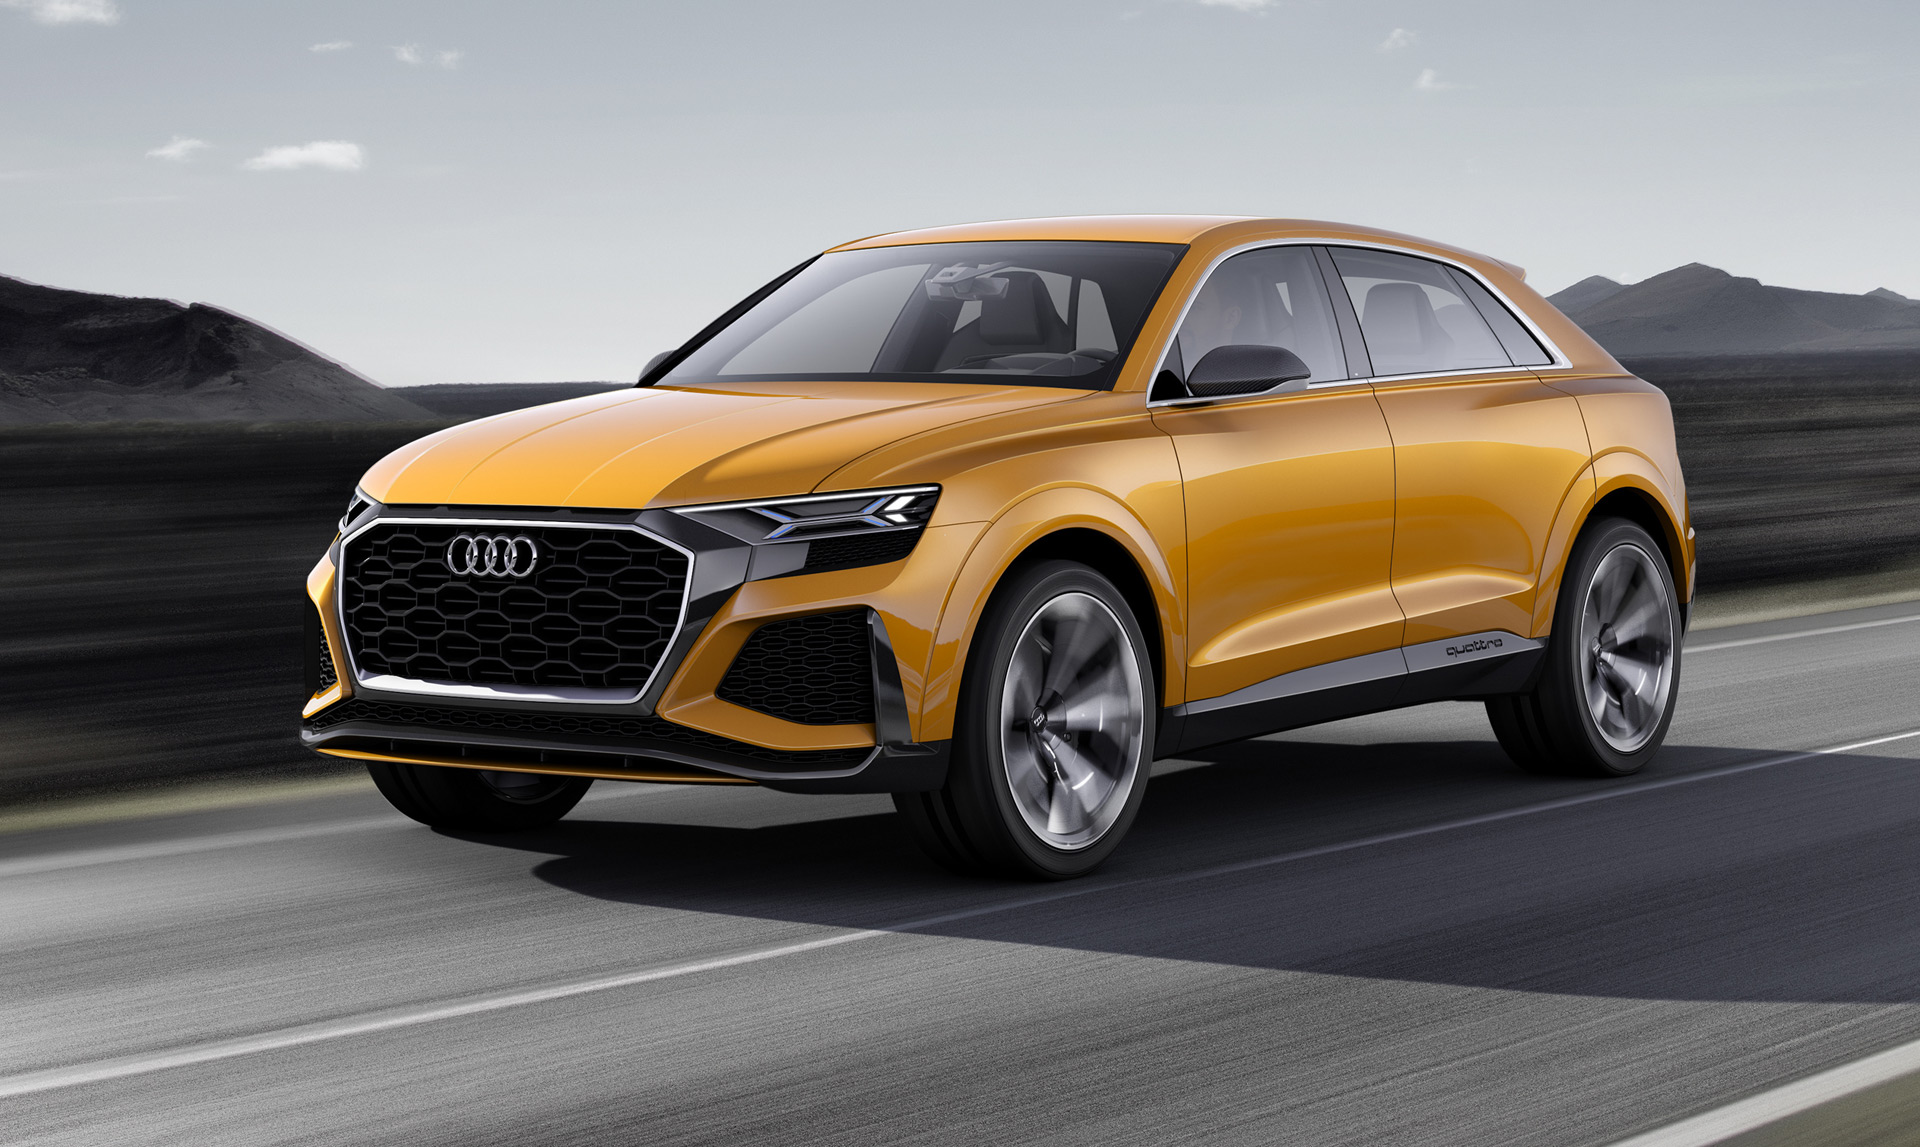 Audi Suv Models >> Most New Audi Rs Models Will Be Suvs